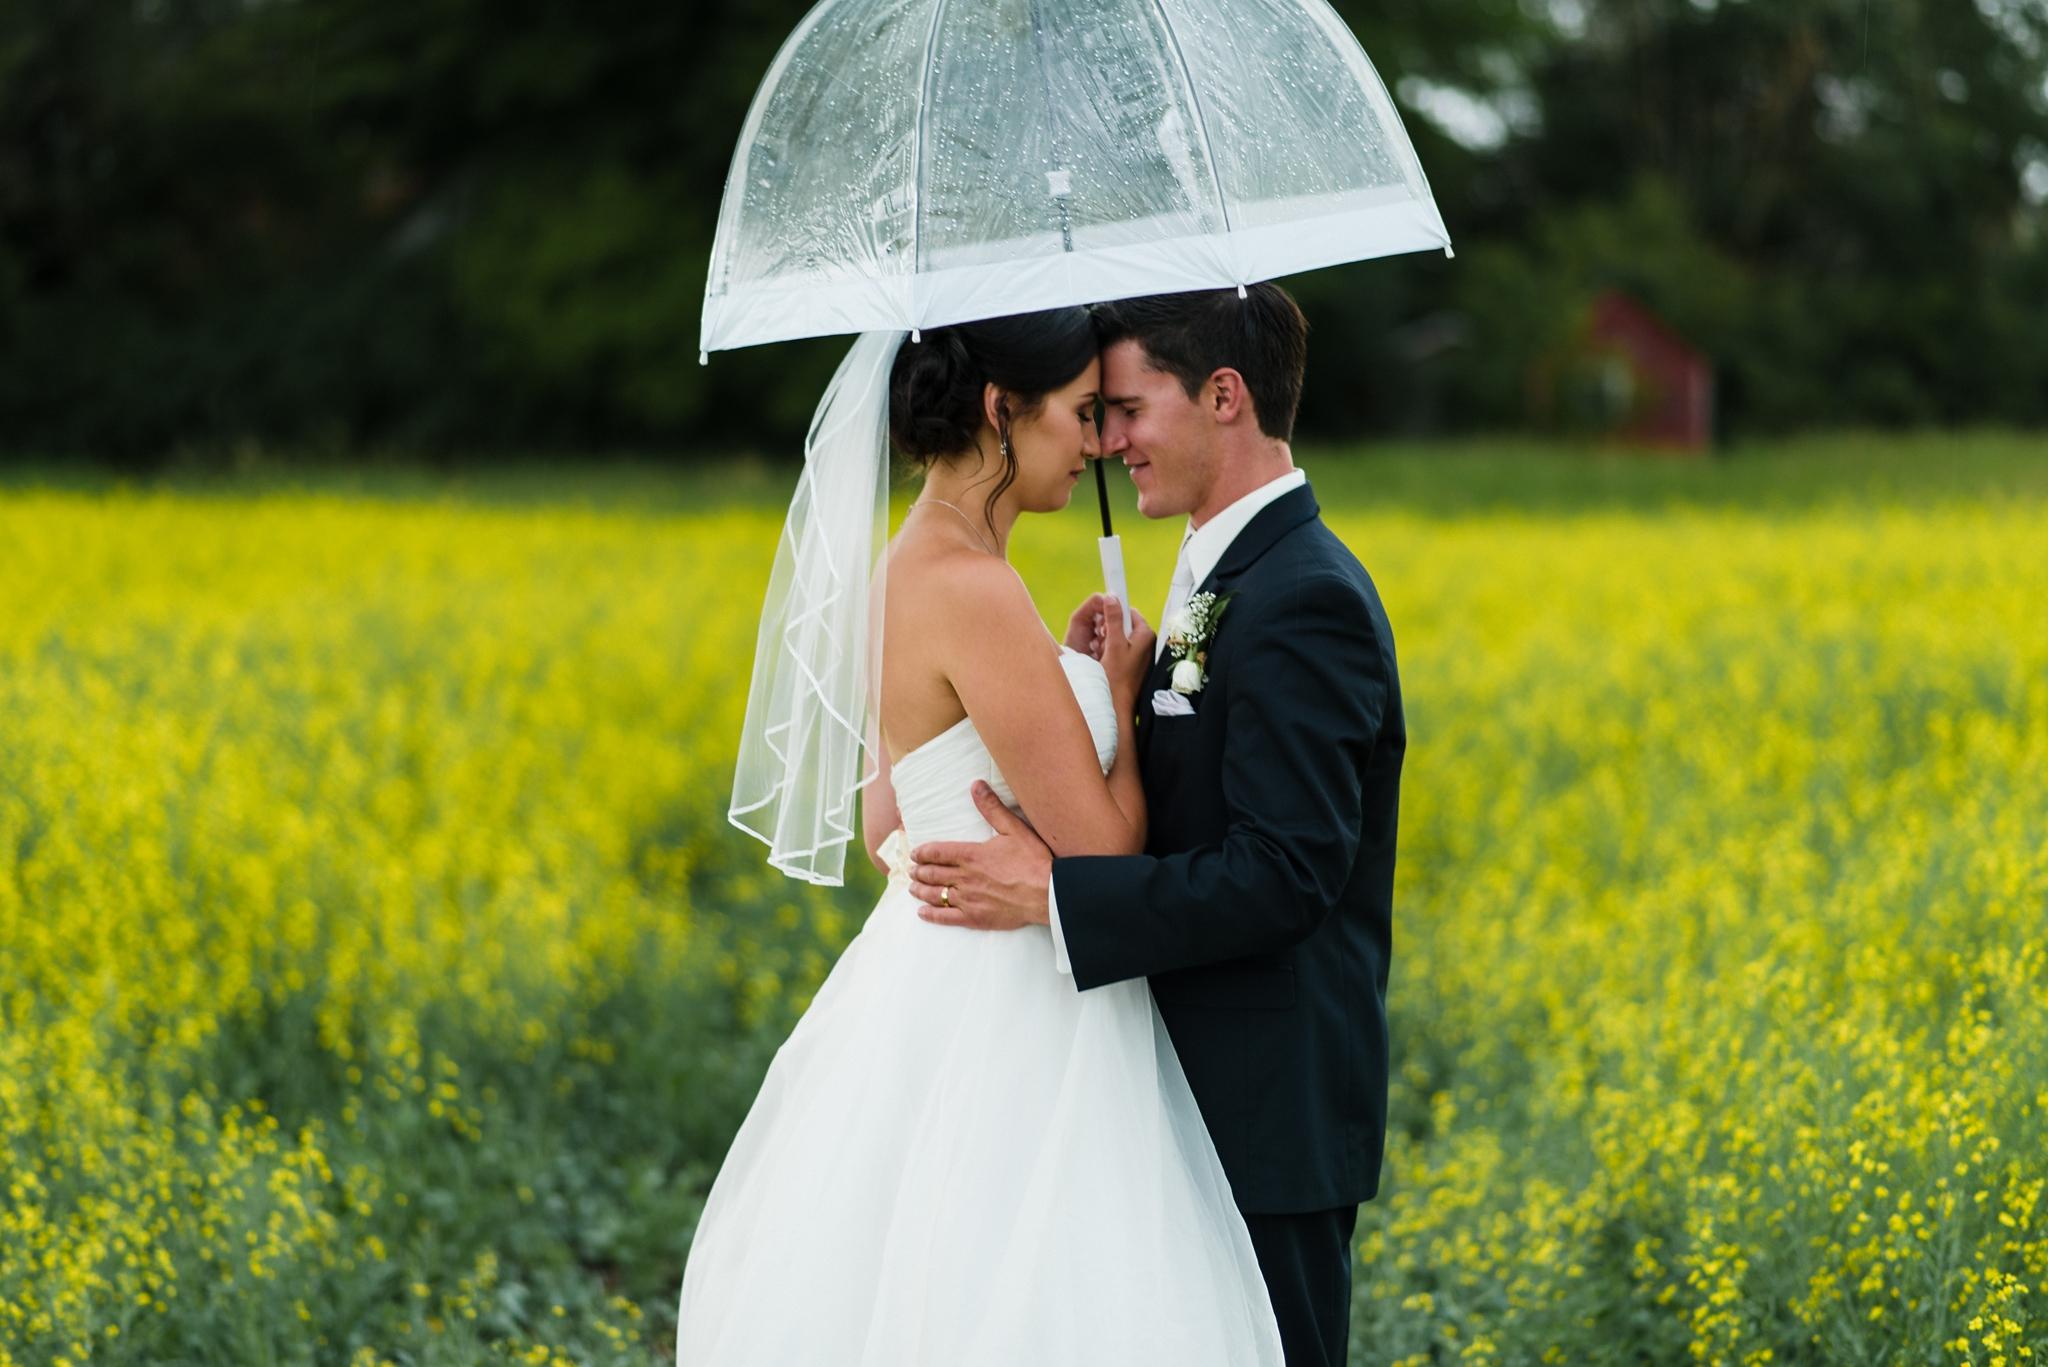 kaihla_tonai_intimate_wedding_elopement_photographer_0115